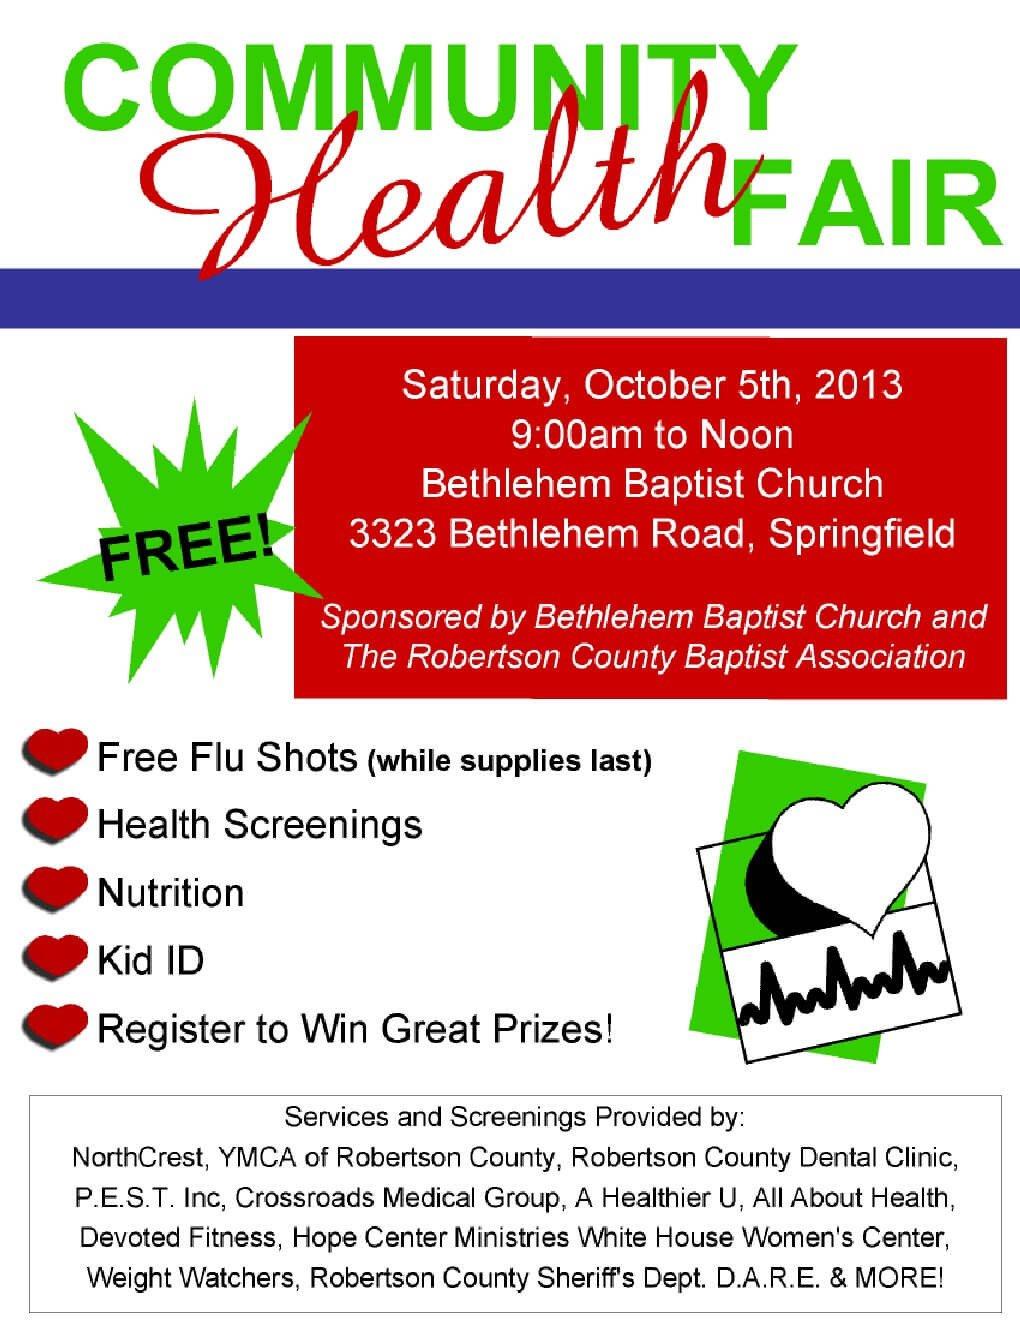 Health Fair Flyer Template Free Free Munity Health Fair October 5th